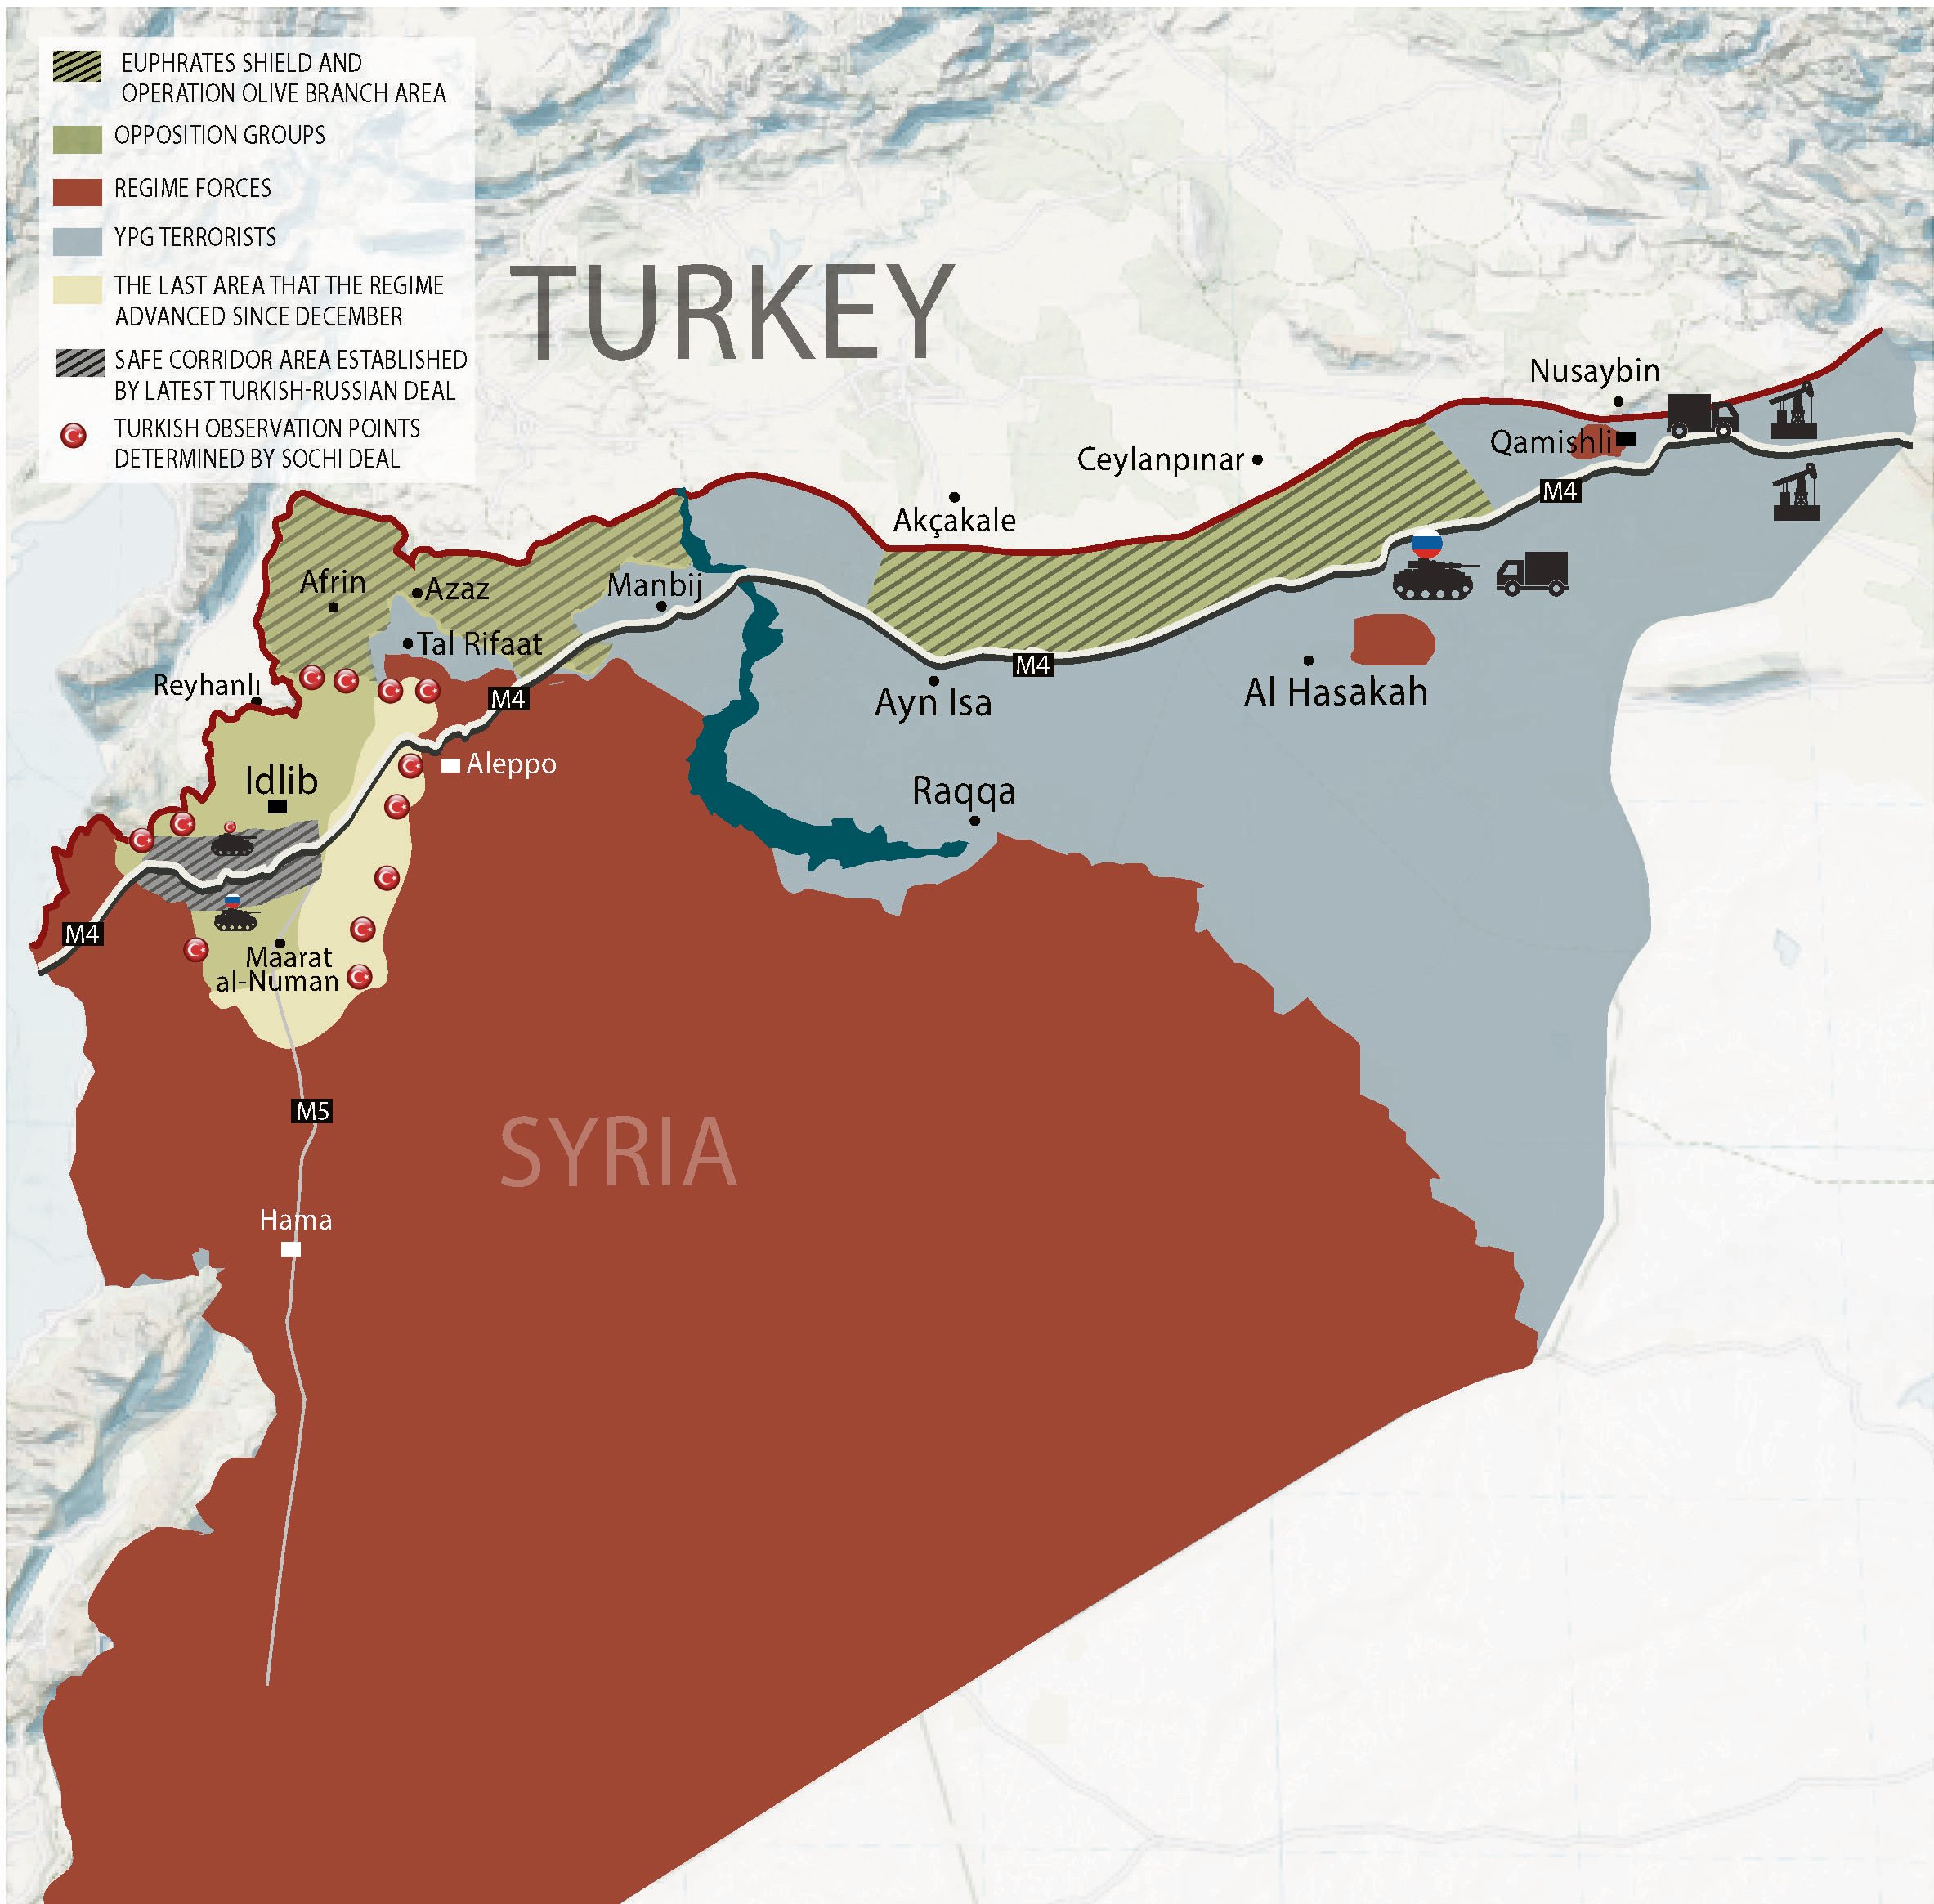 Inforgraphic by Büşra Öztürk.